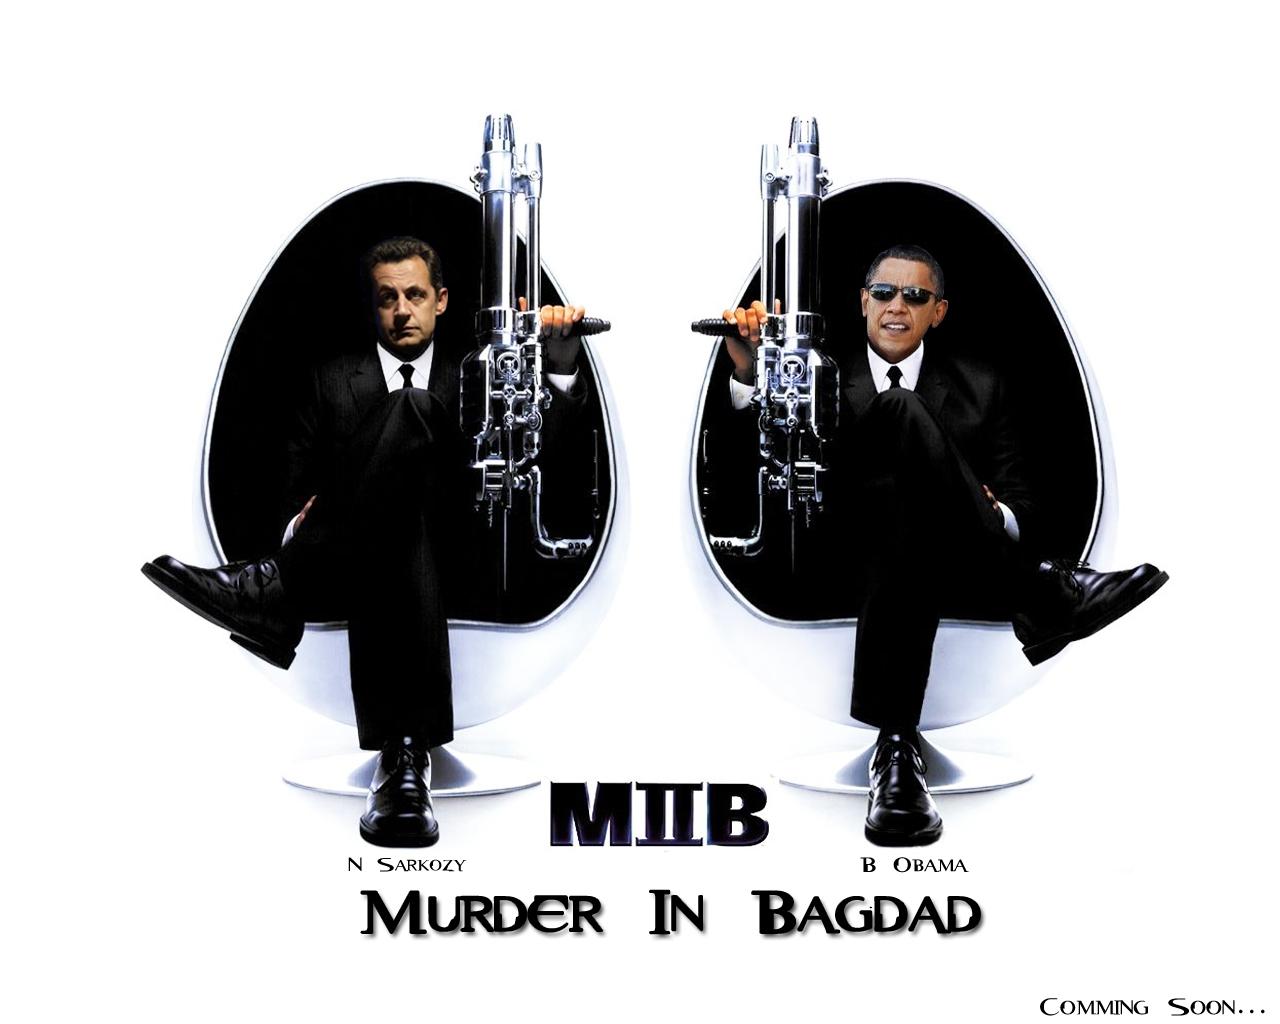 Fonds d'écran Humour Politique MIB